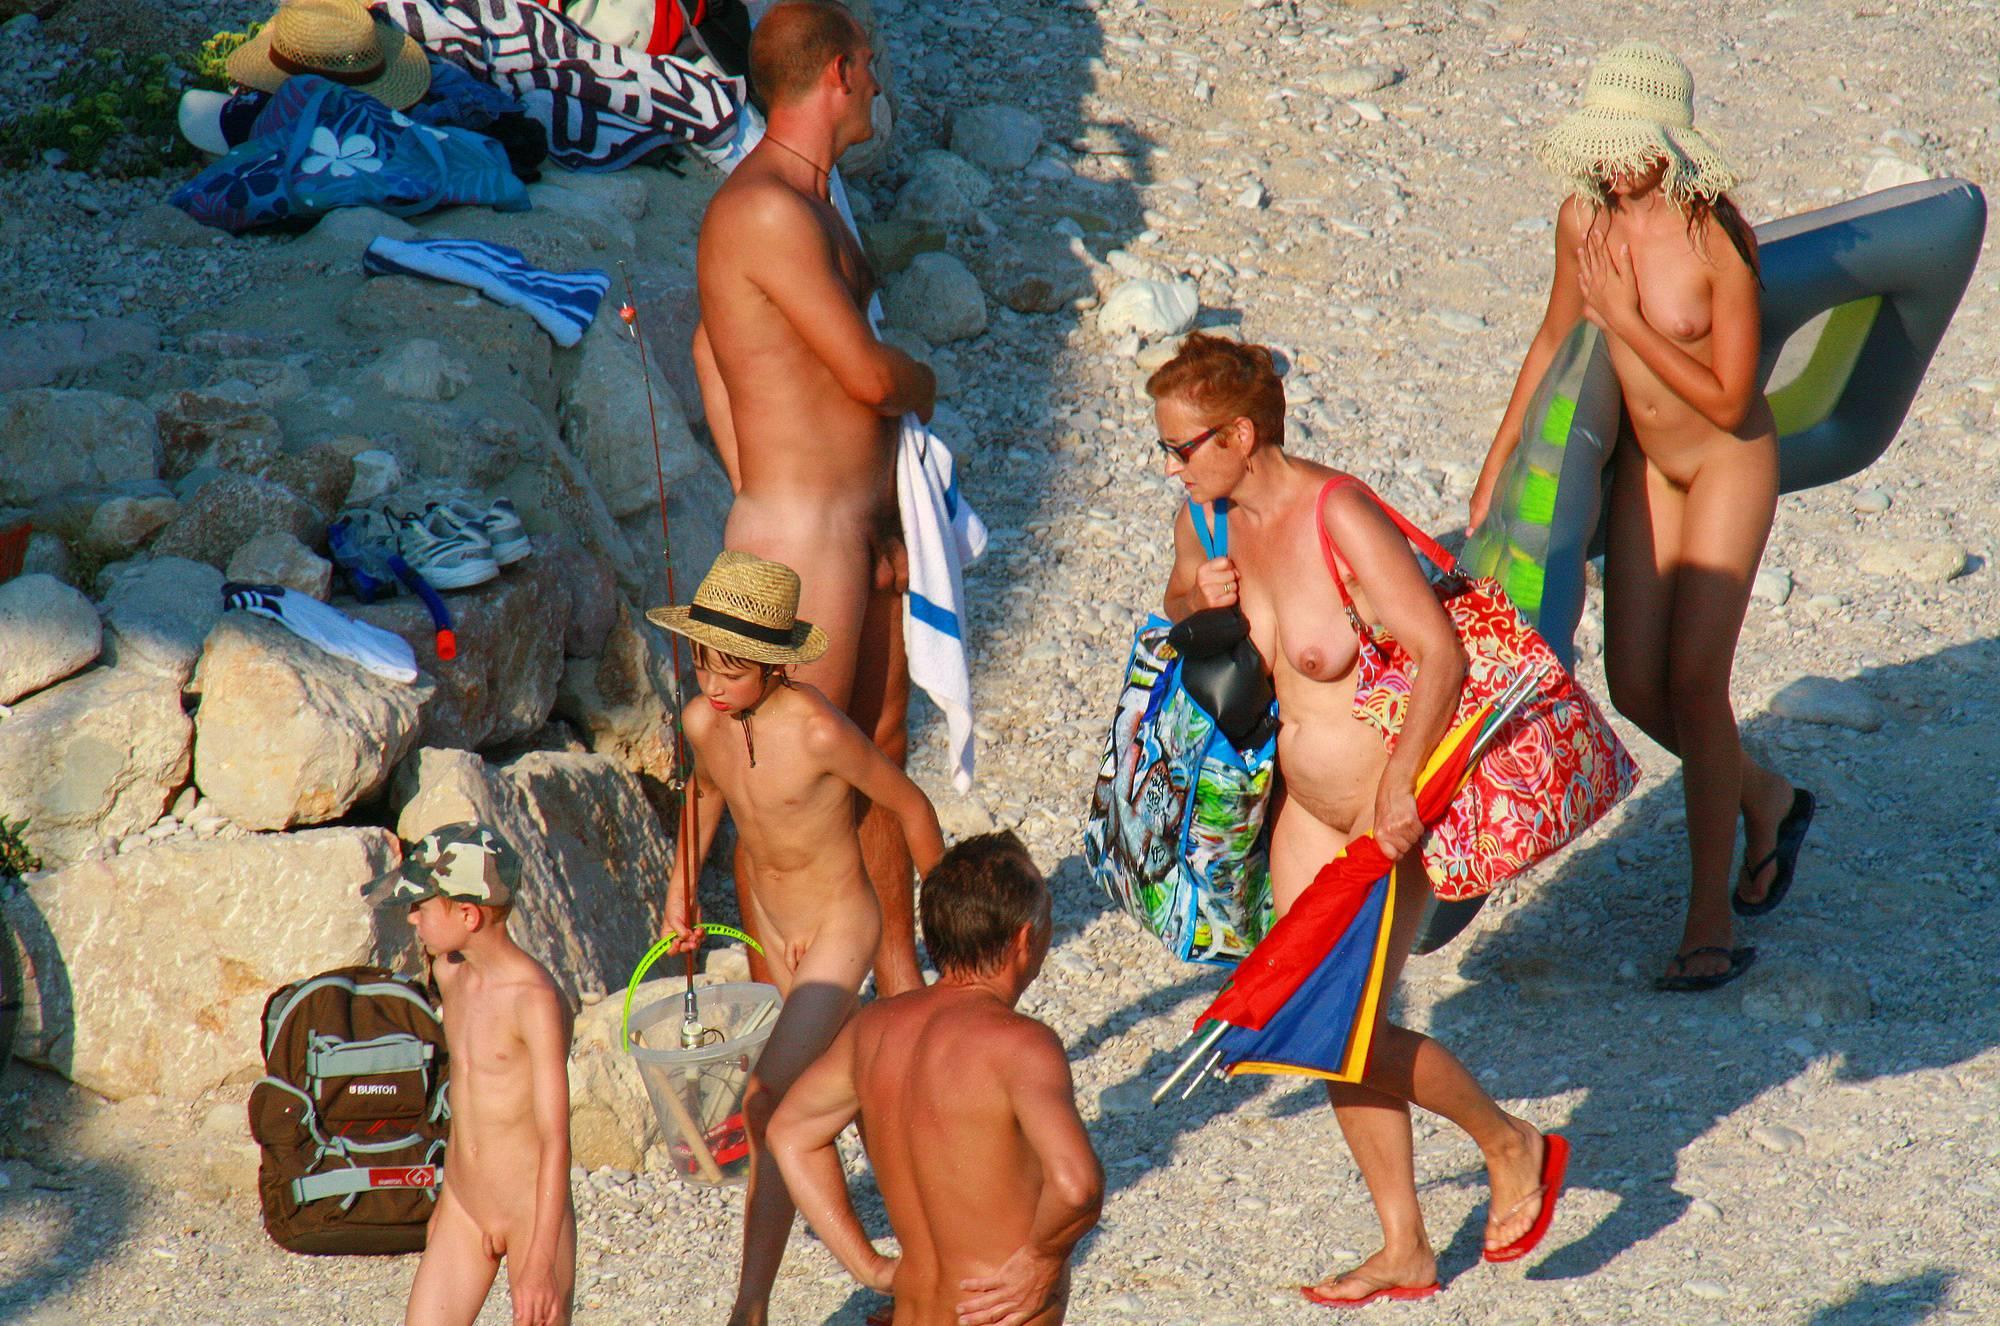 Nudist Pics Ula FKK Beach Family Area - 1